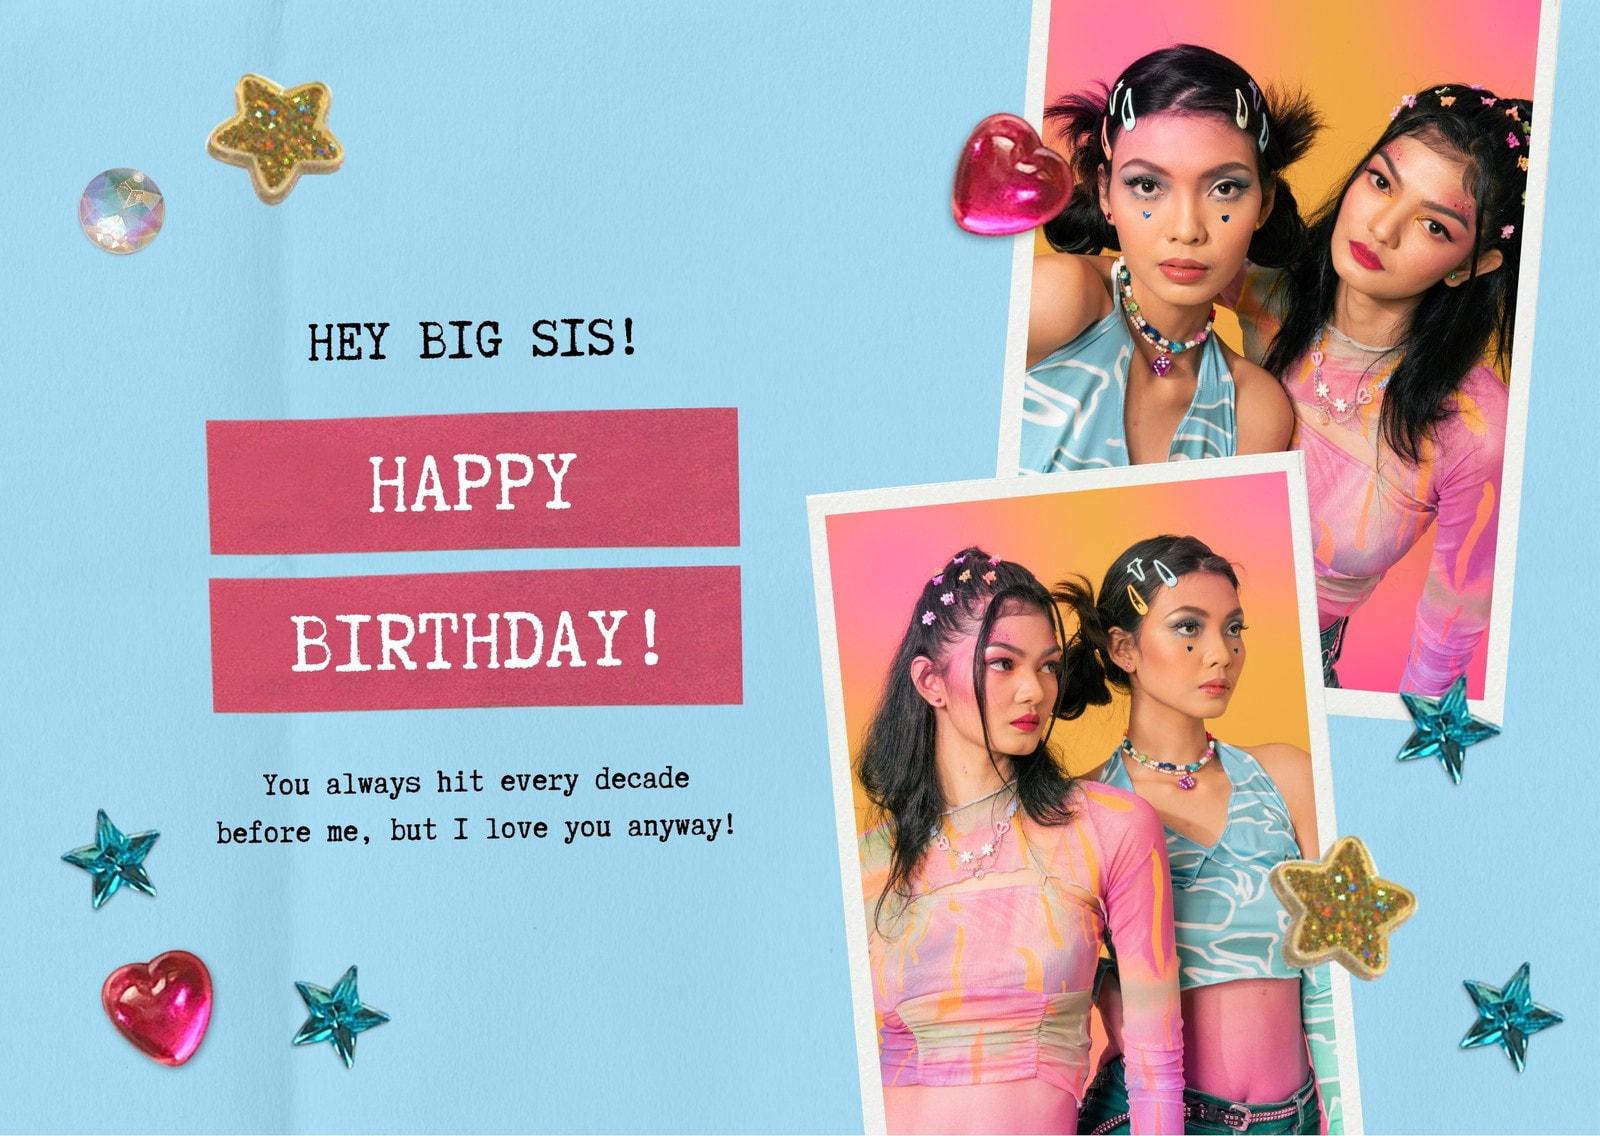 Blue Women 90s Rhinestones Sister's Birthday E-card